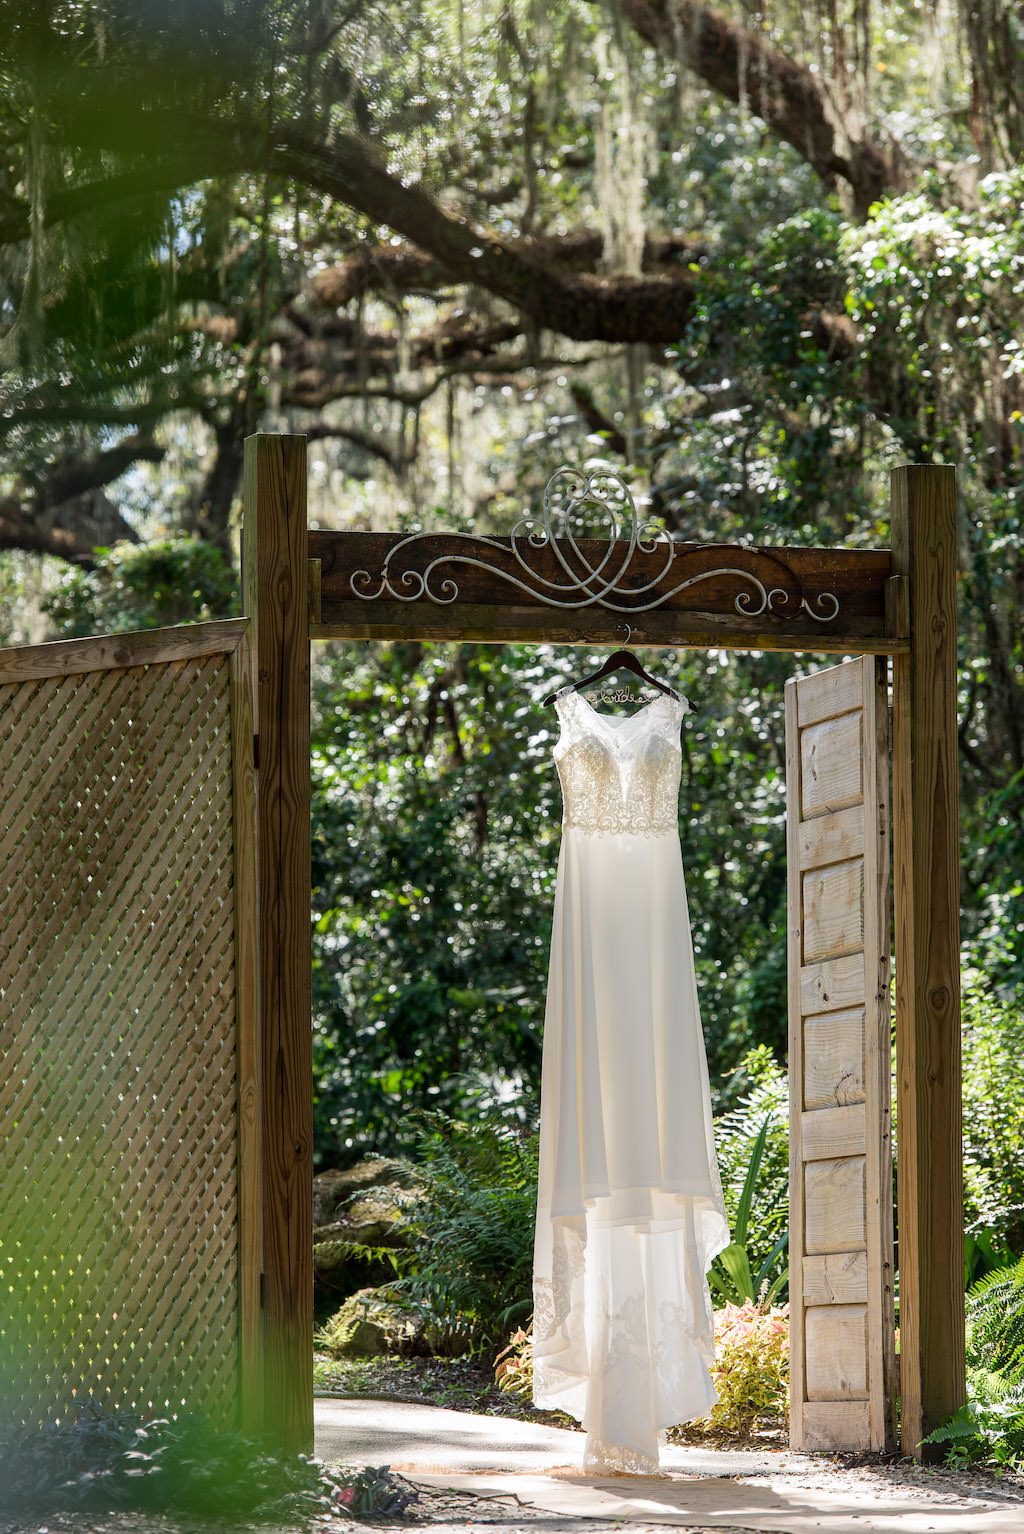 Lace and Chiffon A-Line High Neckline Wedding Dress Hanging on Garden Door Entrance | Tampa Wedding Venue Kathleen's Garden